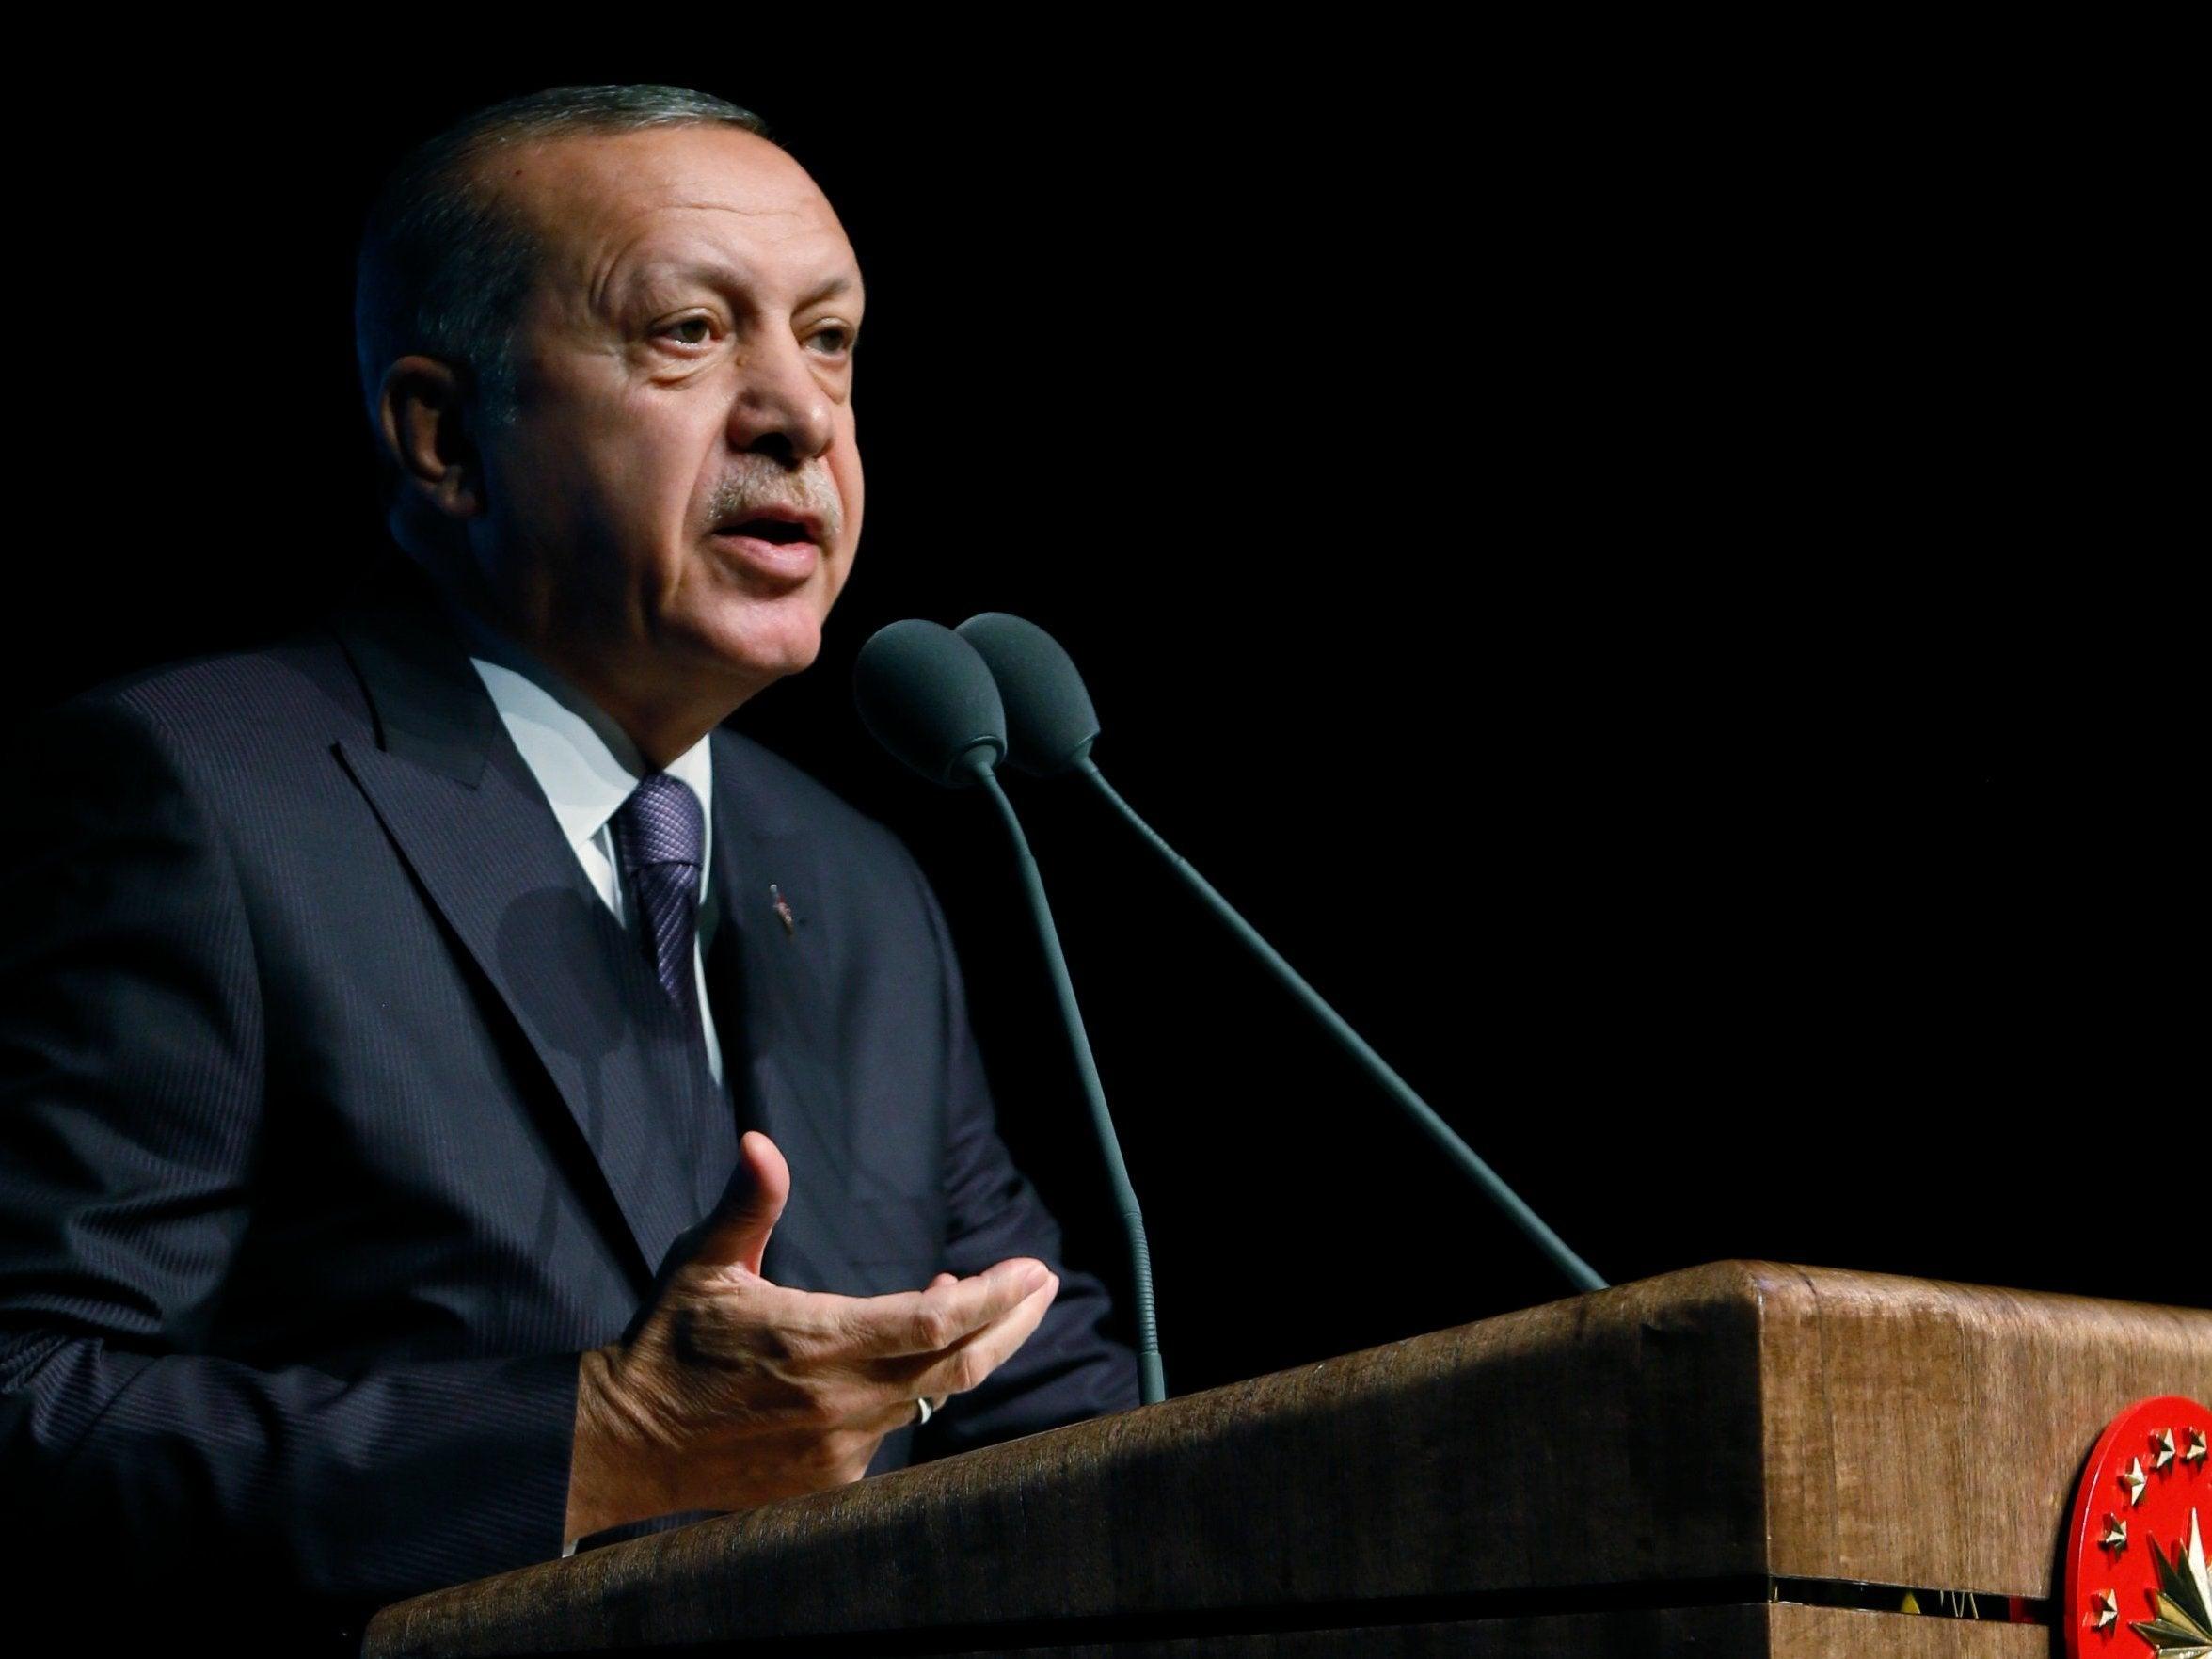 Khashoggi murder: Turkish president Erdogan to release more information on journalist's killing